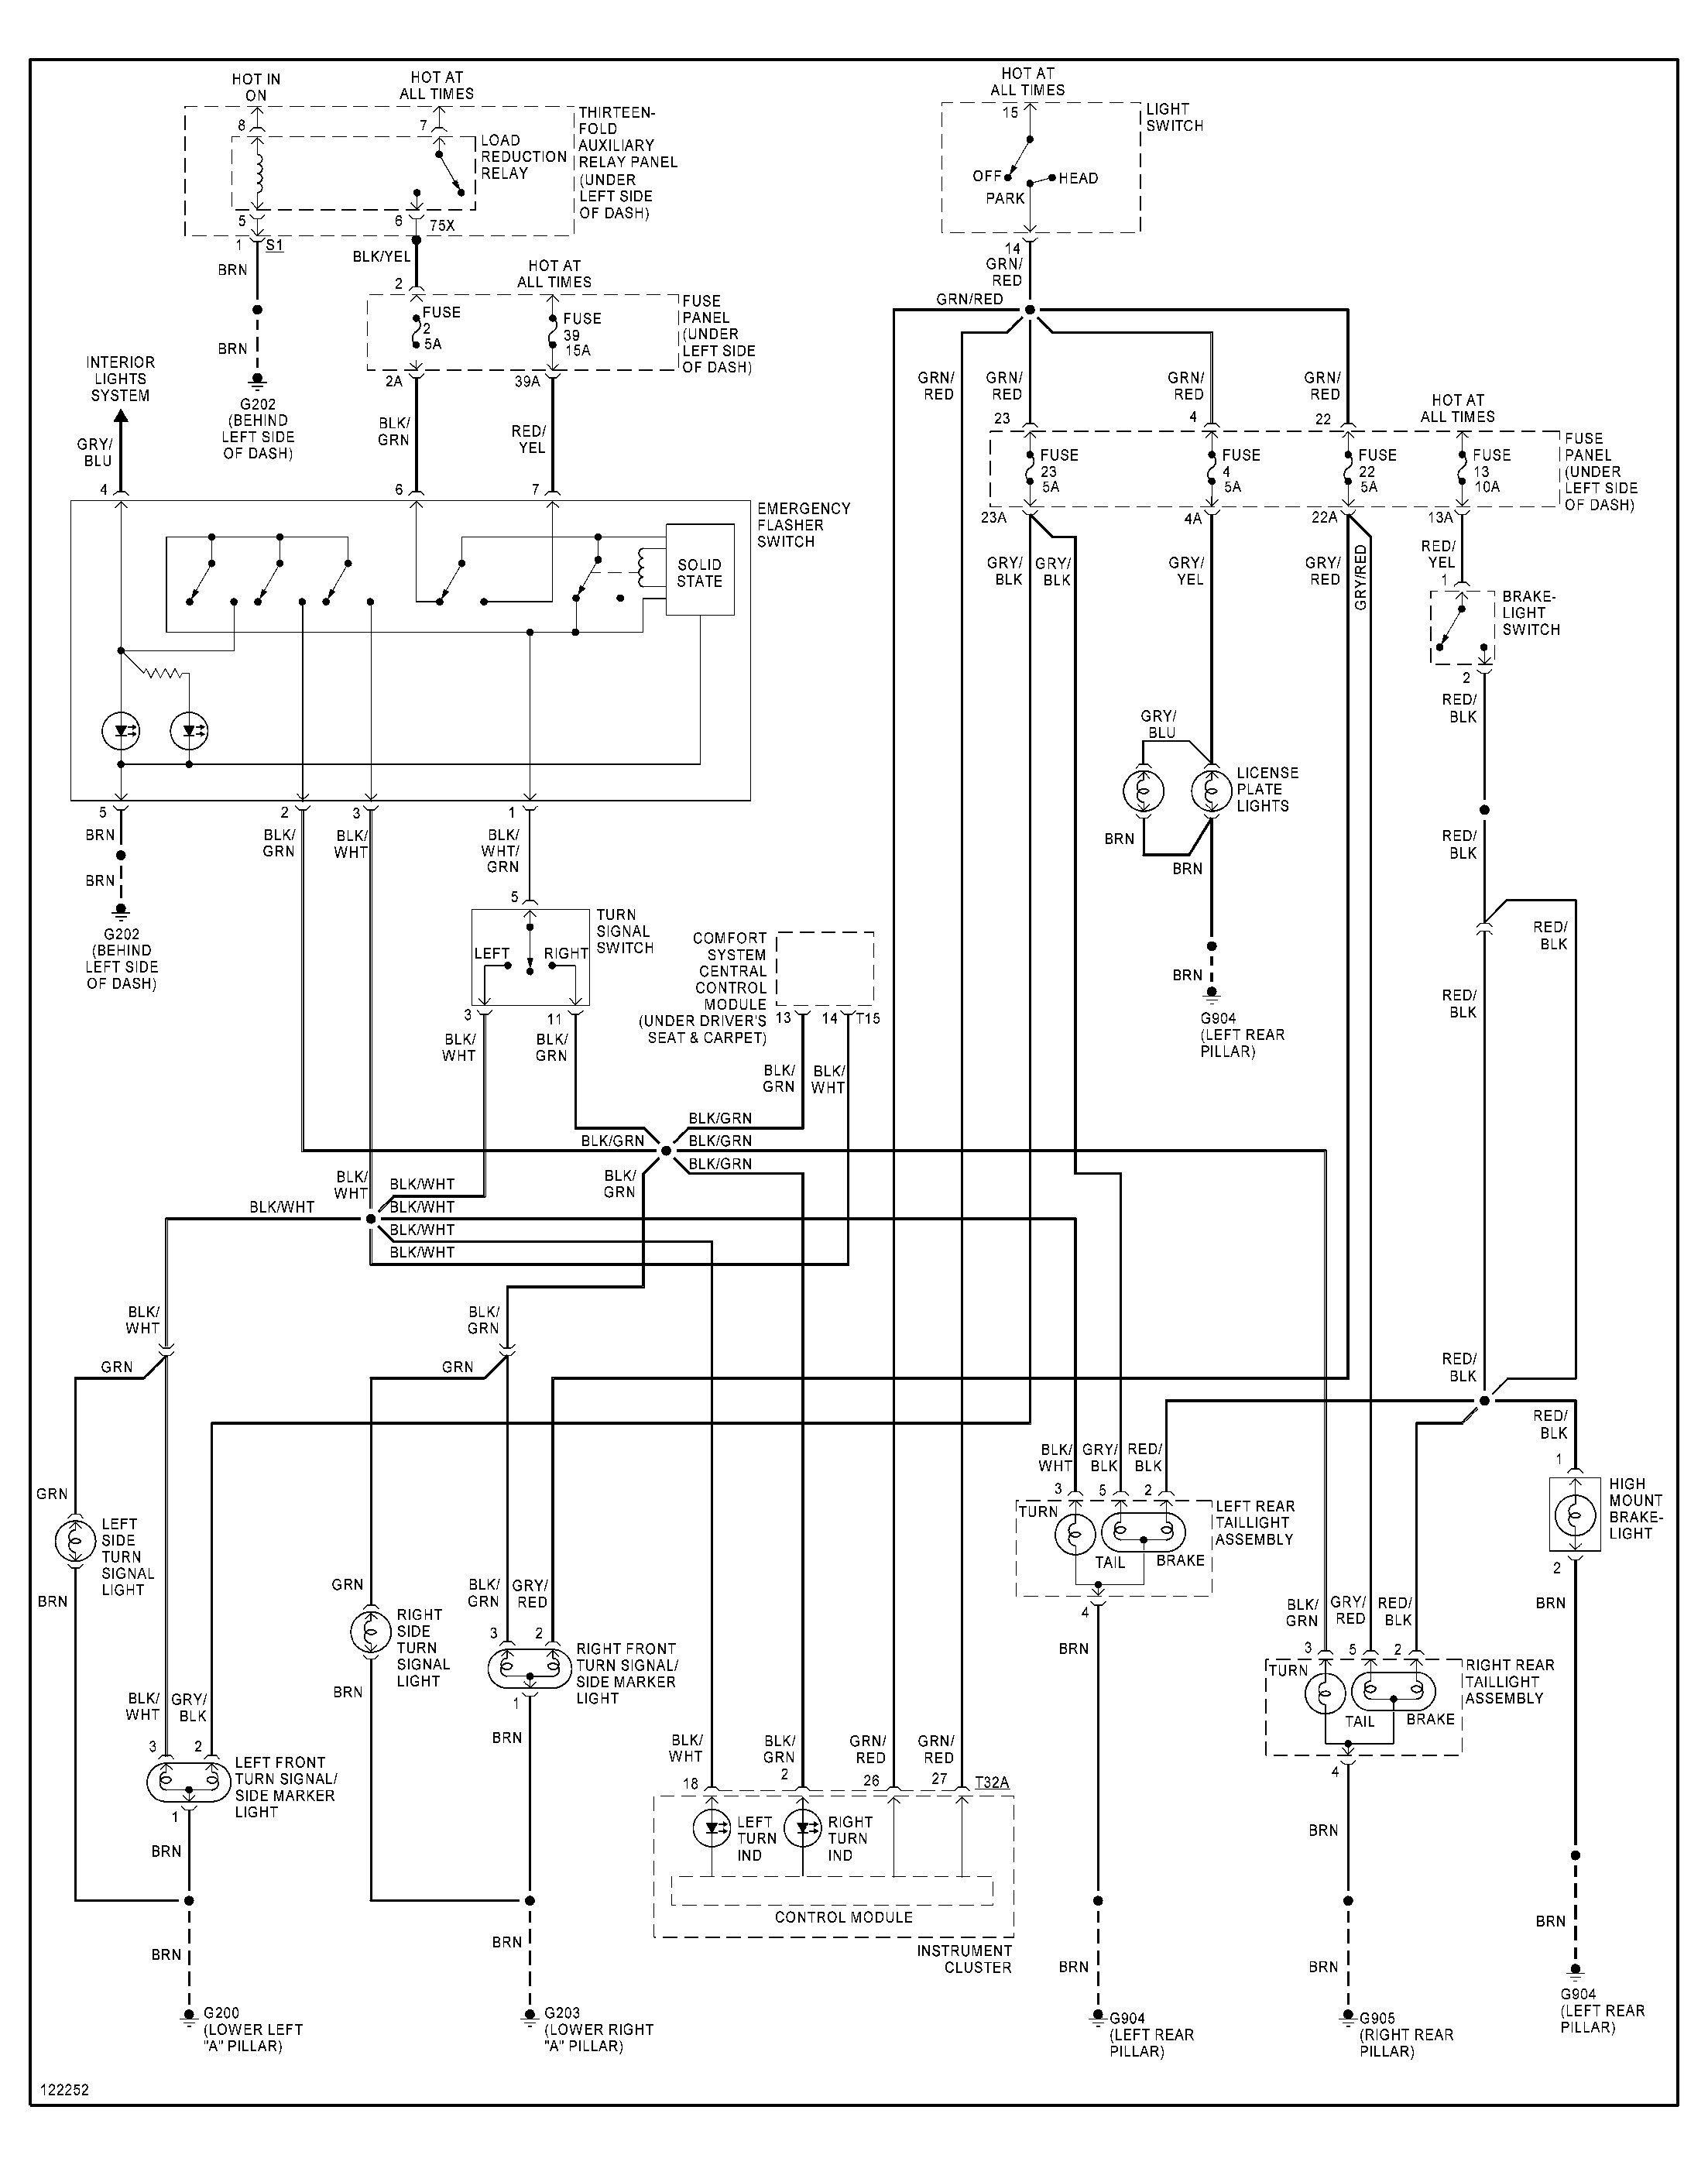 2006 Vw Jetta Engine Diagram Diagram Electrical Wiring Diagram 2006 Vw Jetta